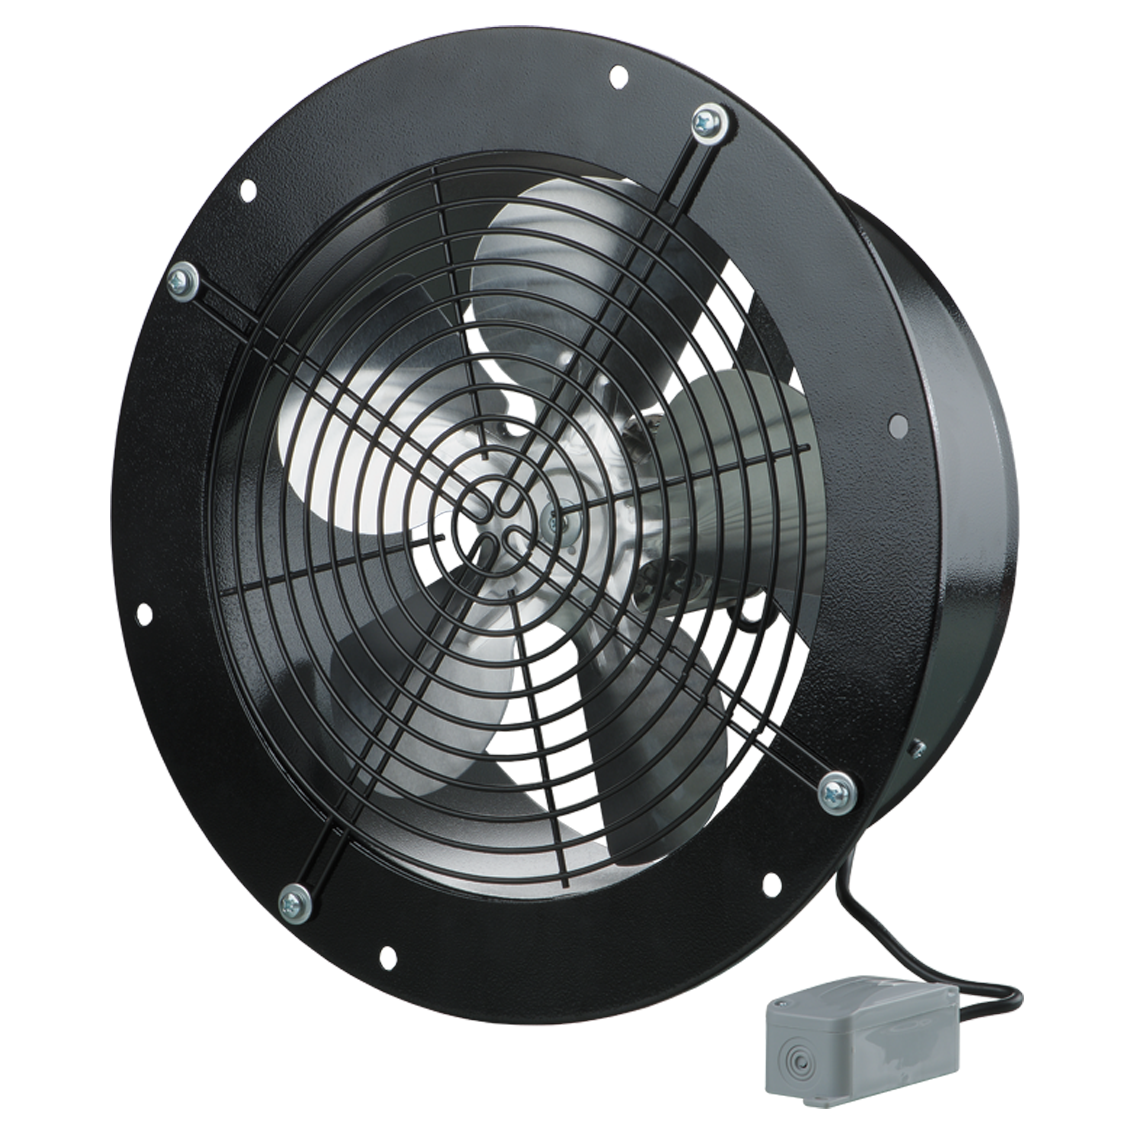 Ventilator aksijalni OVK1 315 Vents Elektro Vukojevic